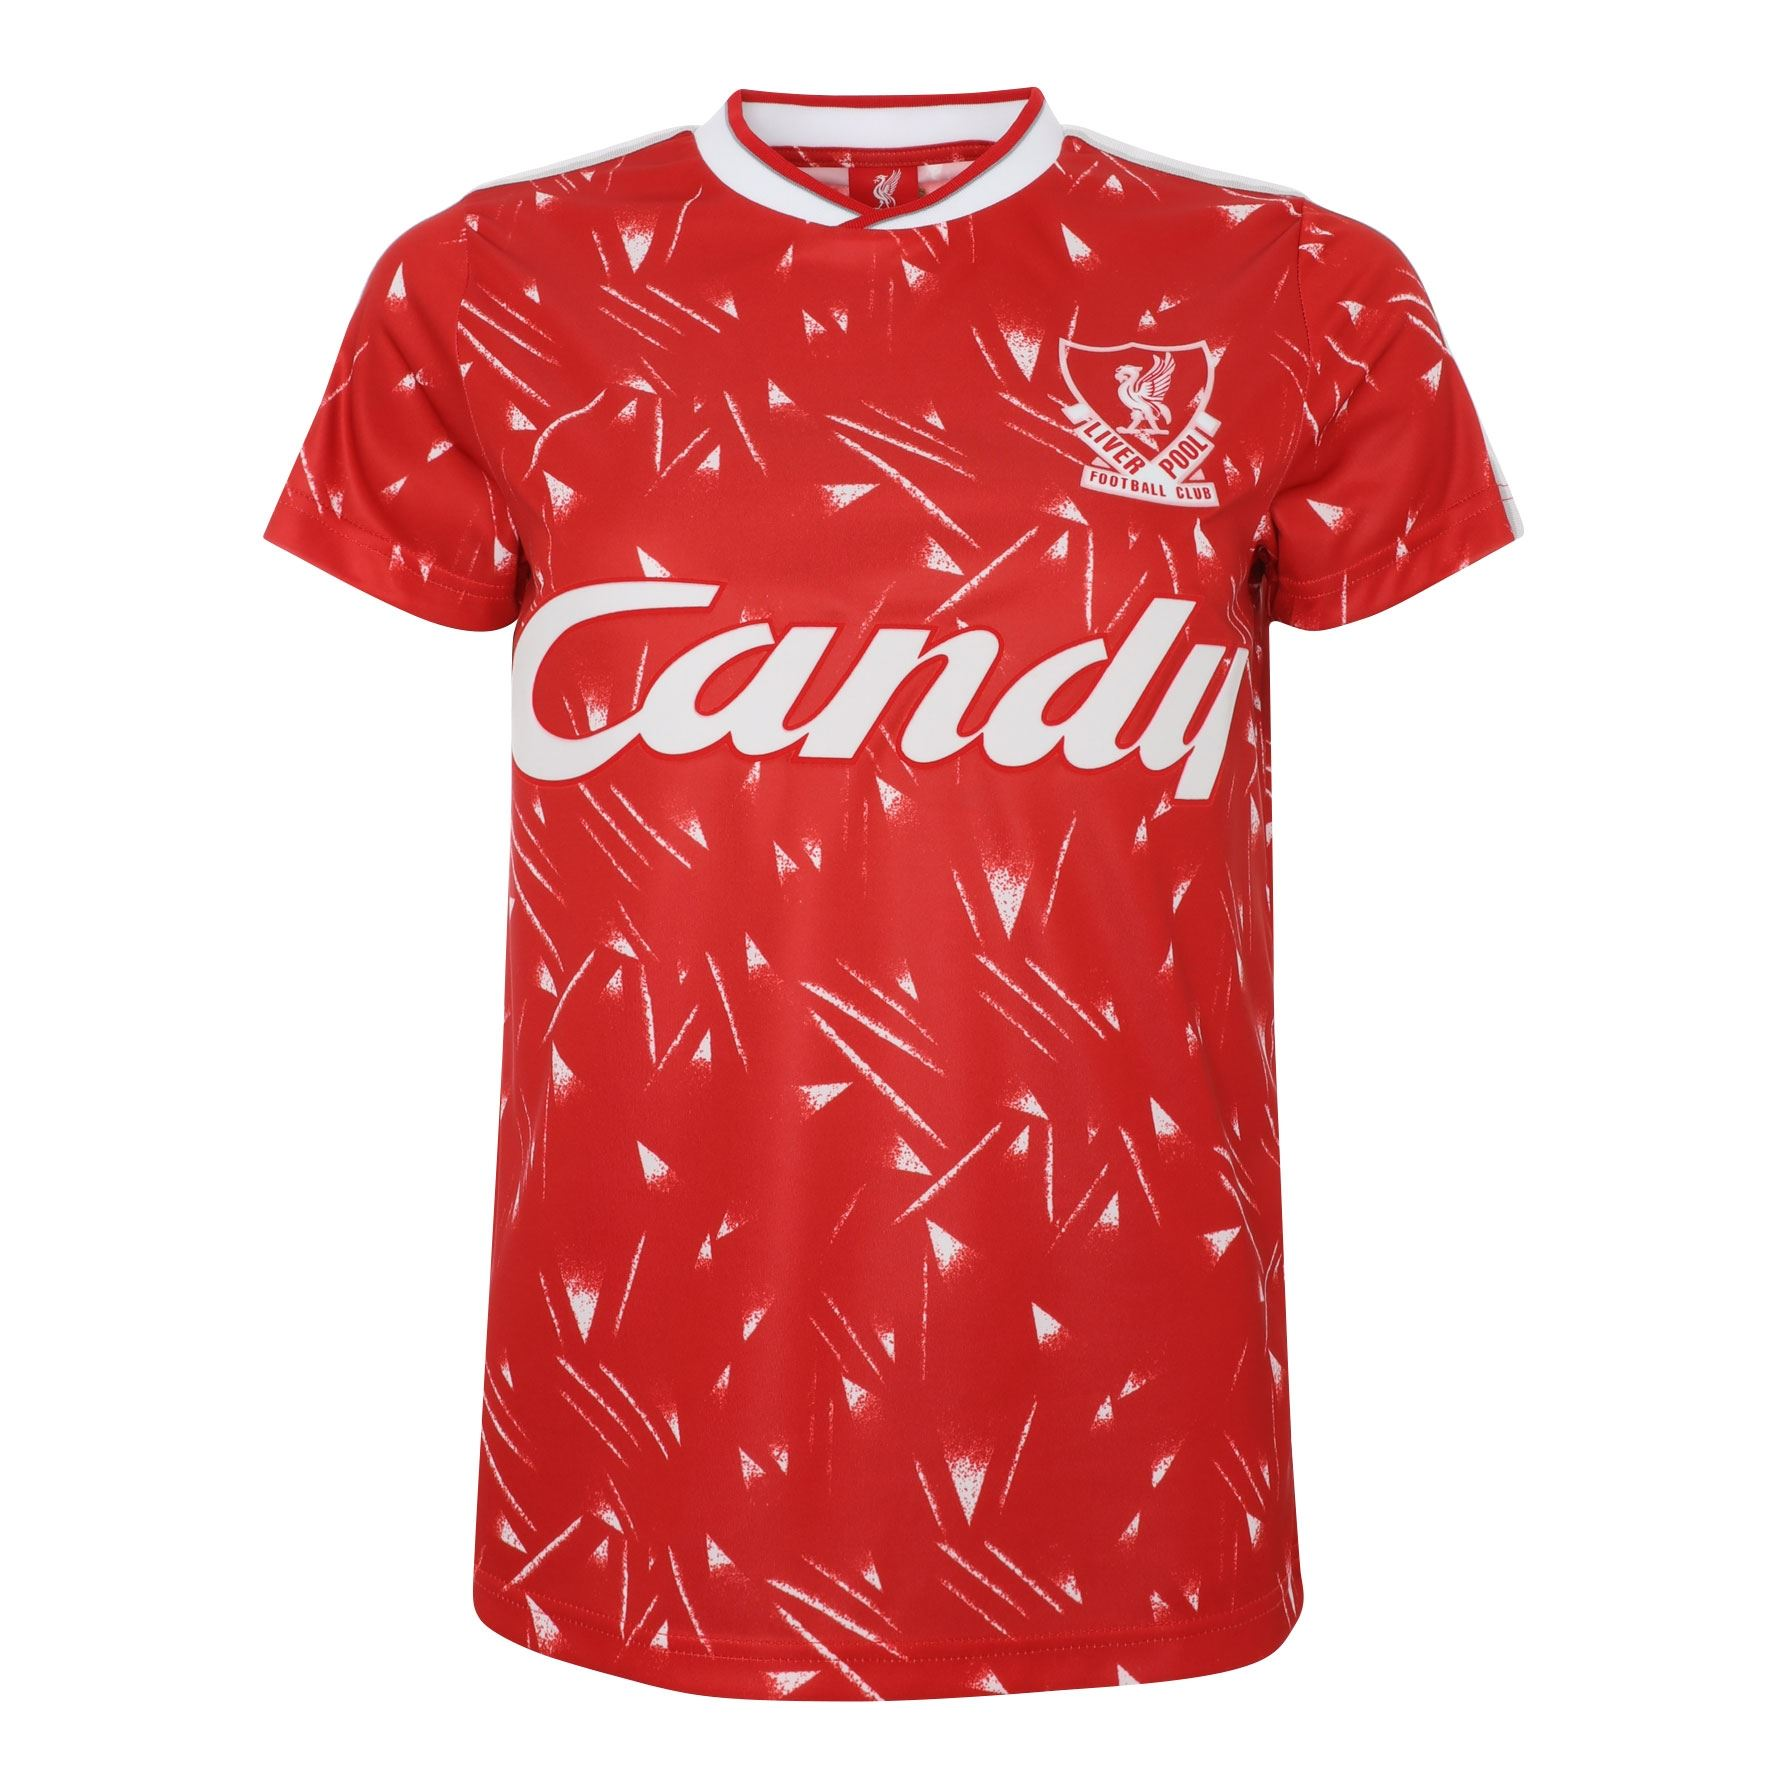 Liverpool Fan World Club Champions Retro Ringer Football T-Shirt 2019